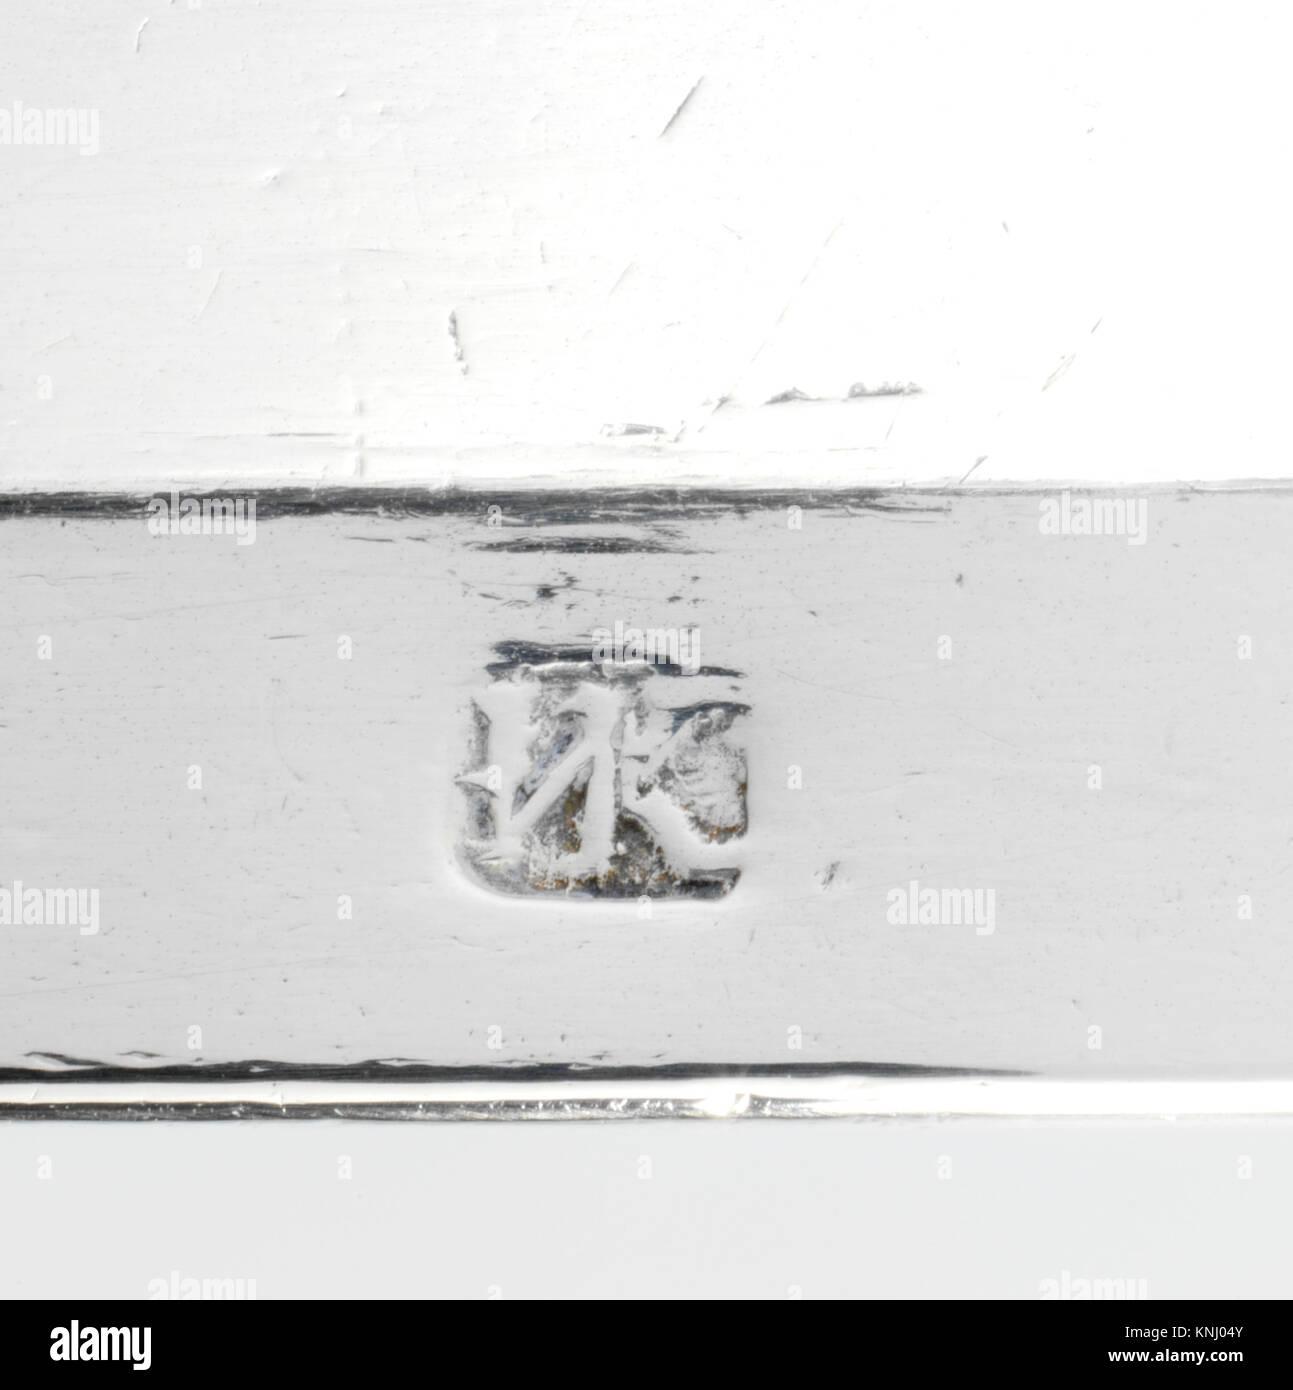 Covered Porringer MET DP160405 2439 Maker: Marked by INK or IVK, Covered Porringer, 1700?20, Silver, Overall: 4 - Stock Image